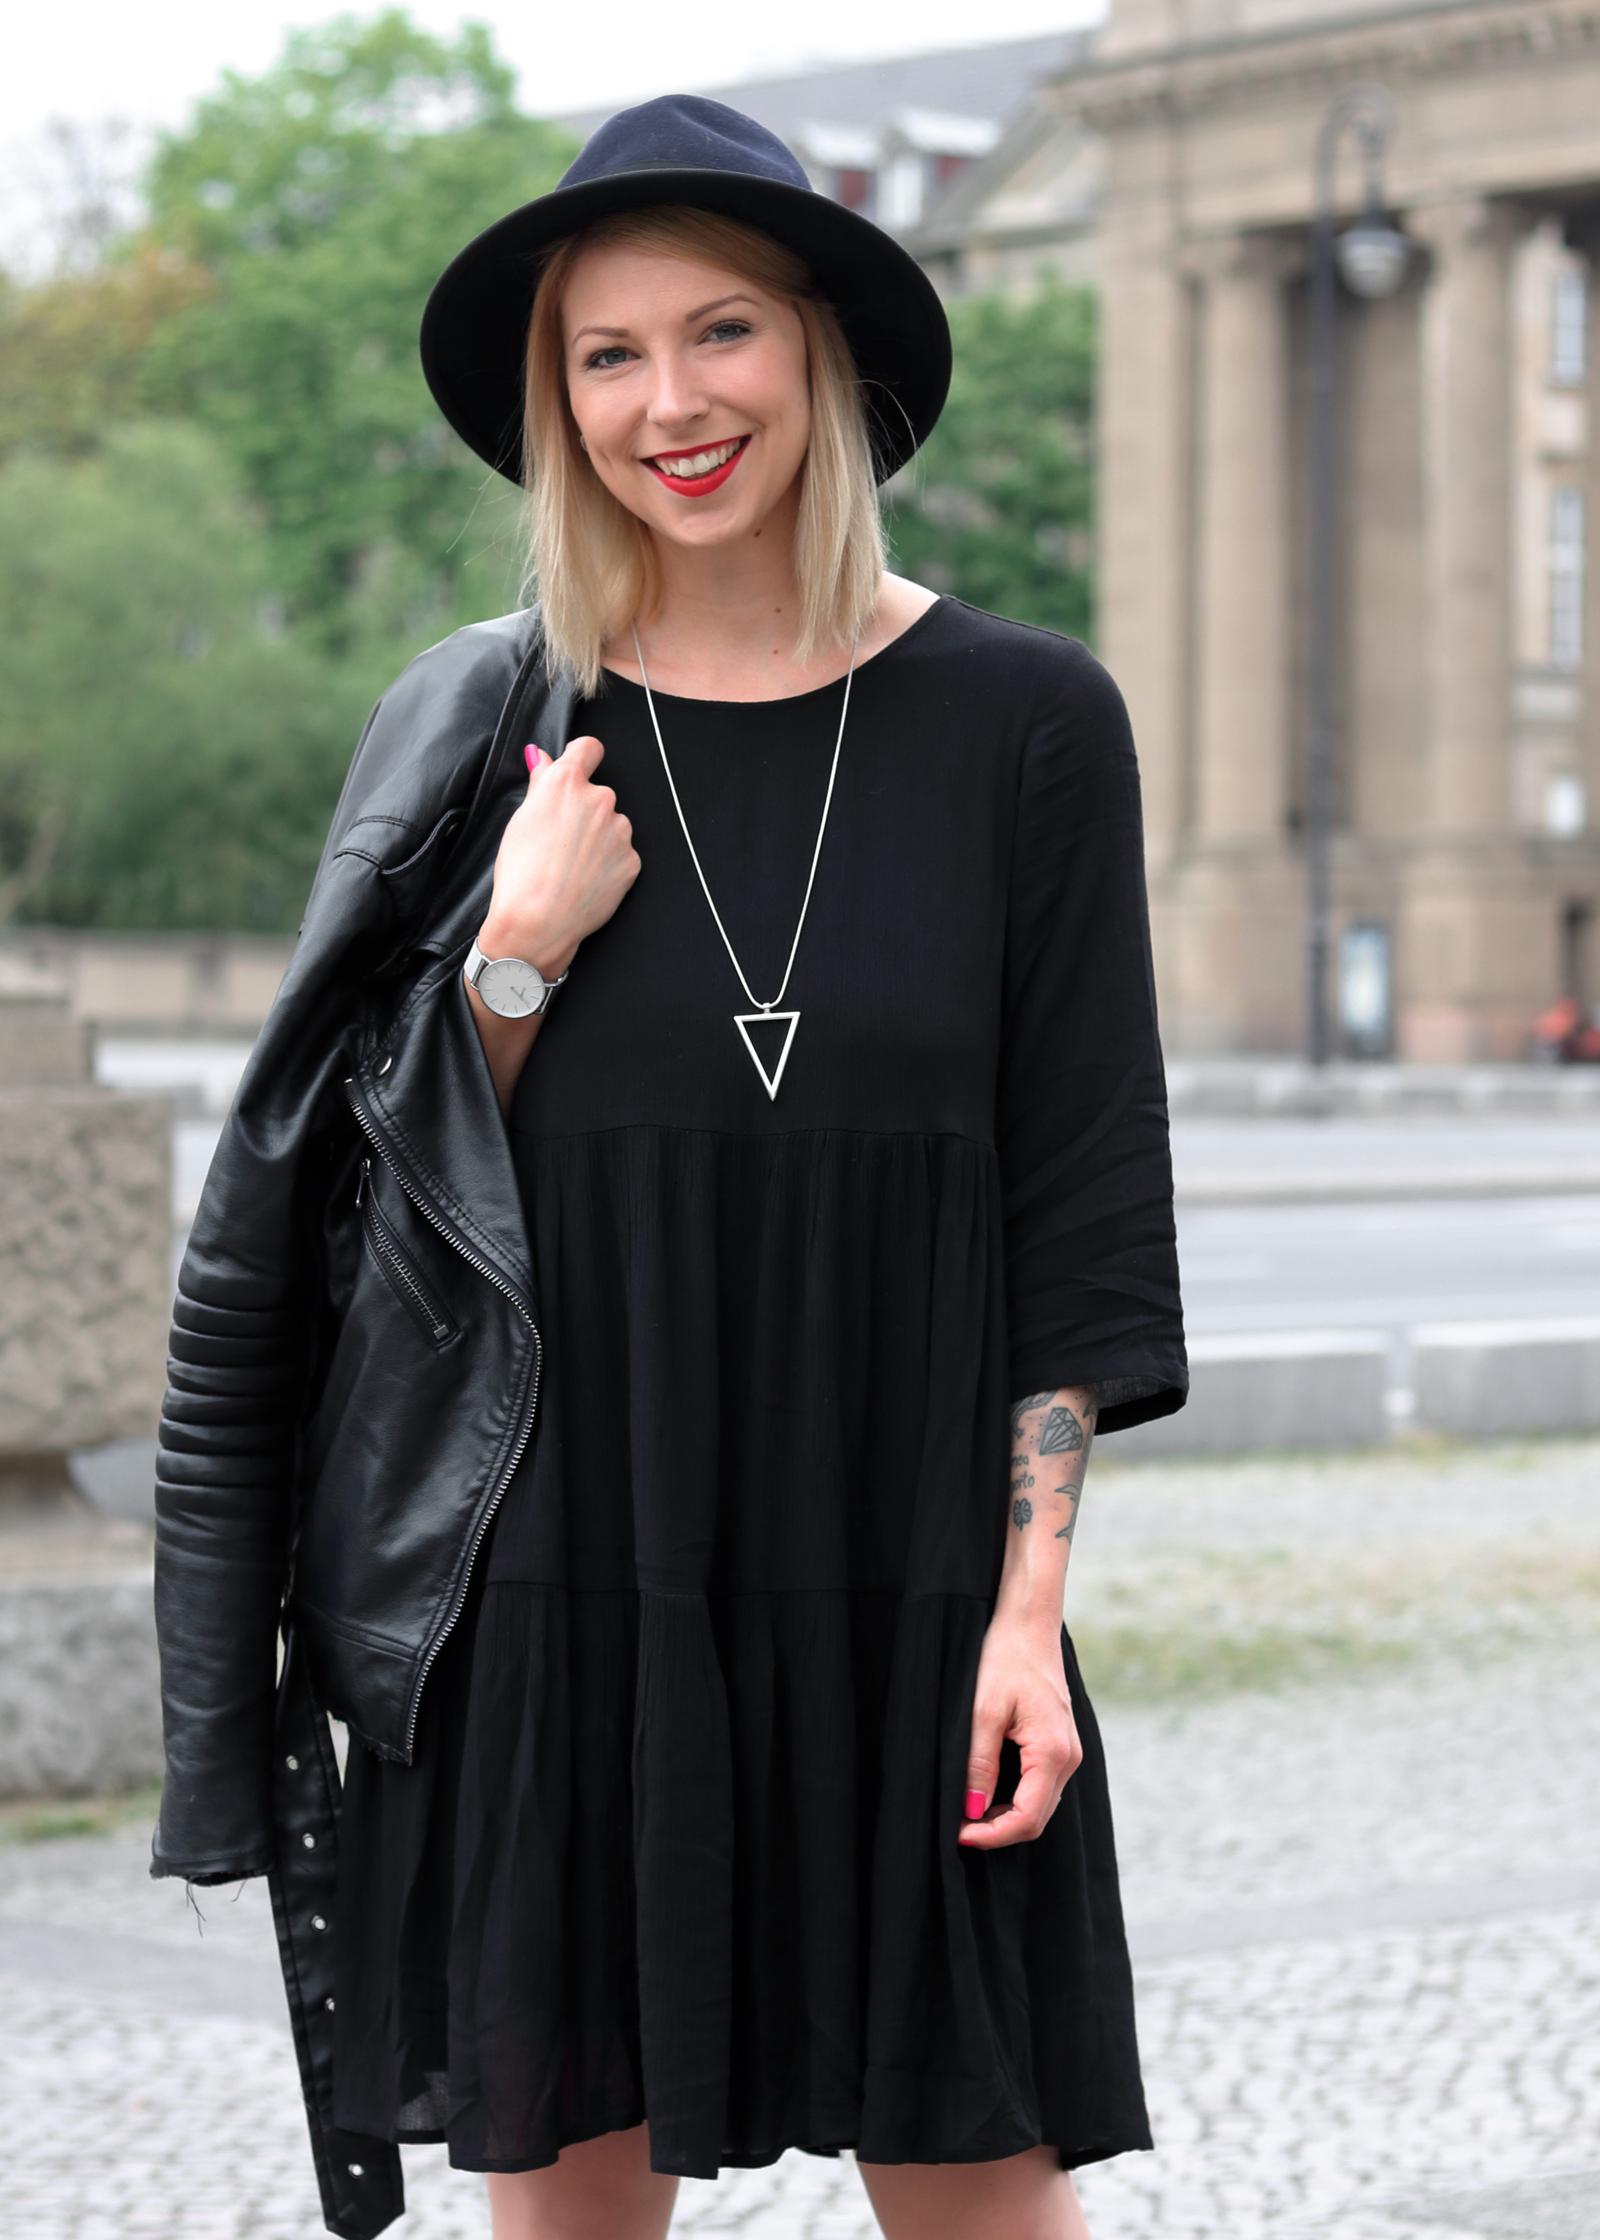 schwarzes kleid mit lederjacke elegante kleider dieses jahr. Black Bedroom Furniture Sets. Home Design Ideas